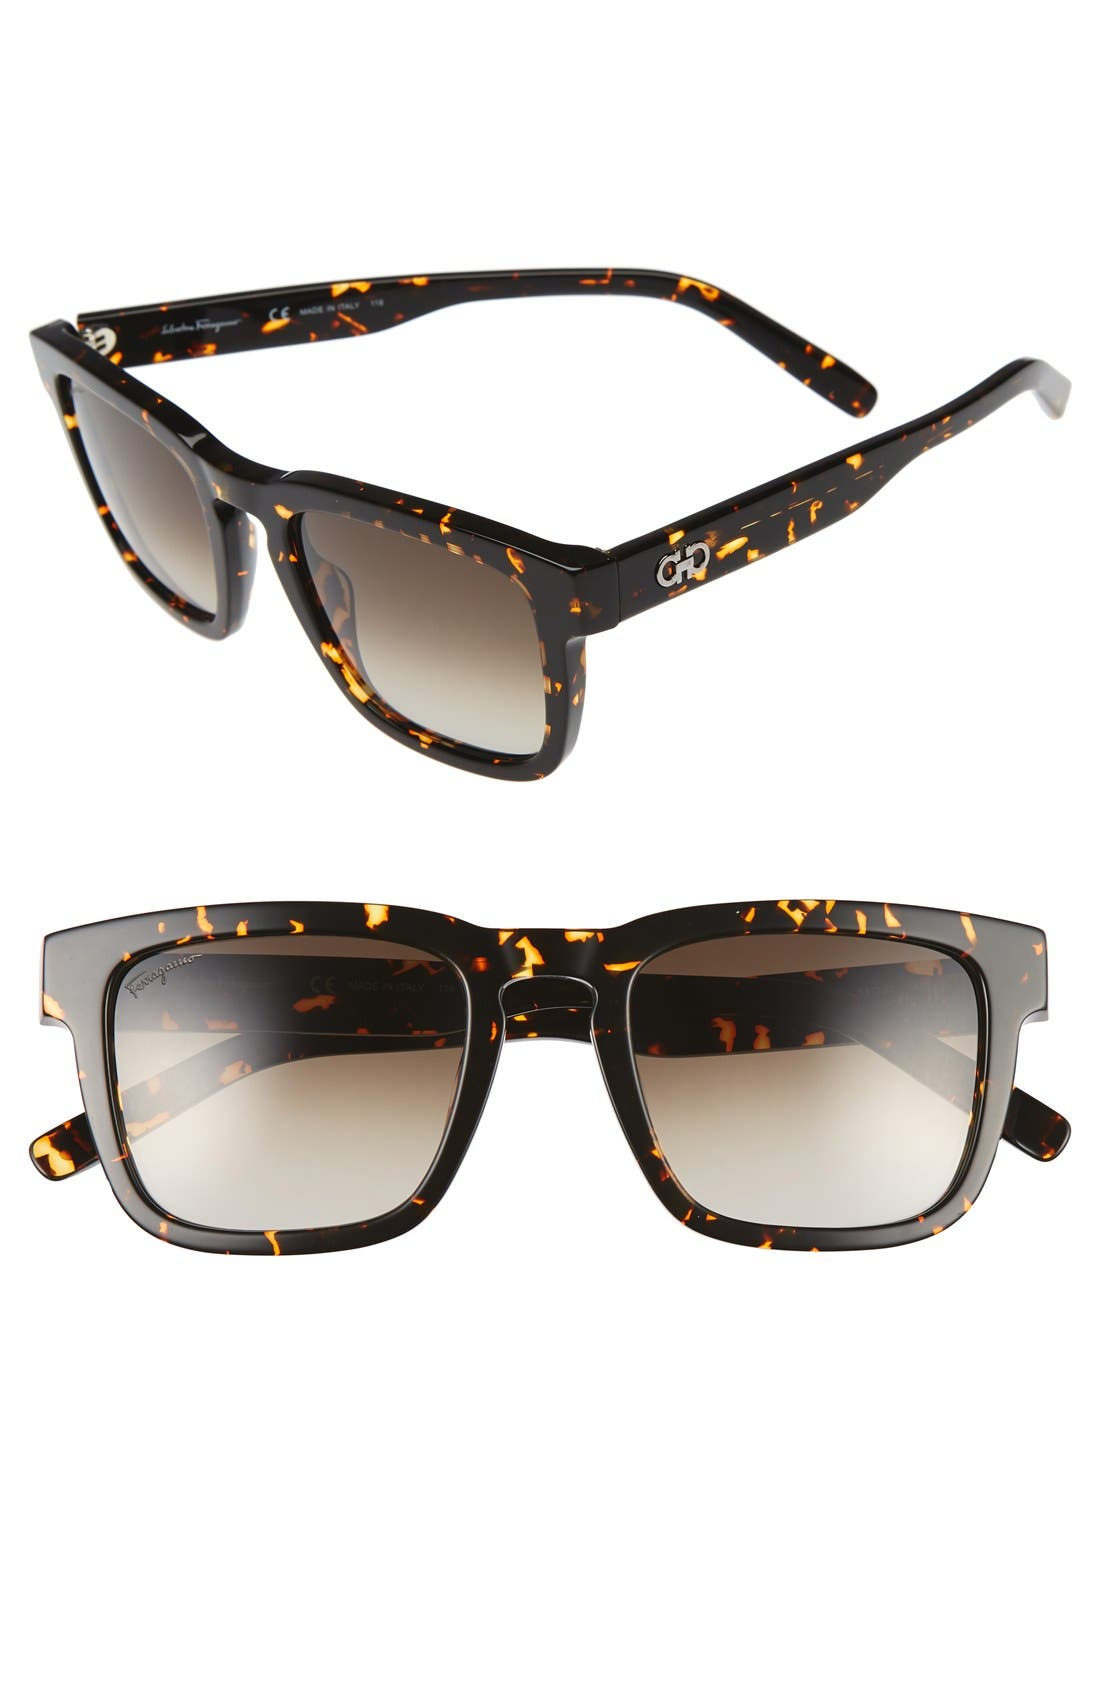 51mm Square Sunglasses,                             Main thumbnail 1, color,                             Vintage Tortoise